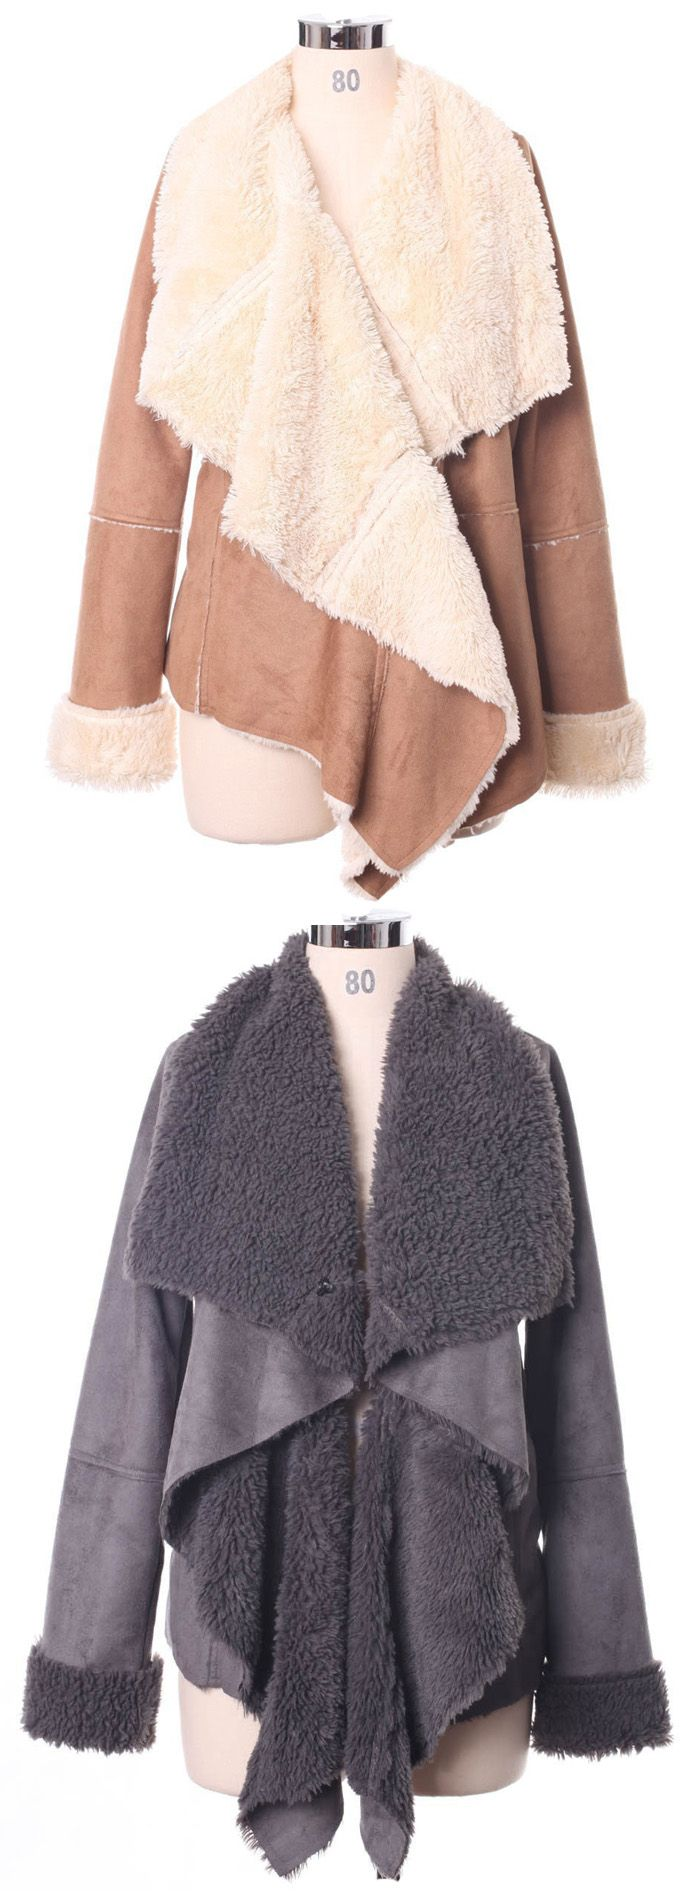 autumn, winter drape shearing jacket for women